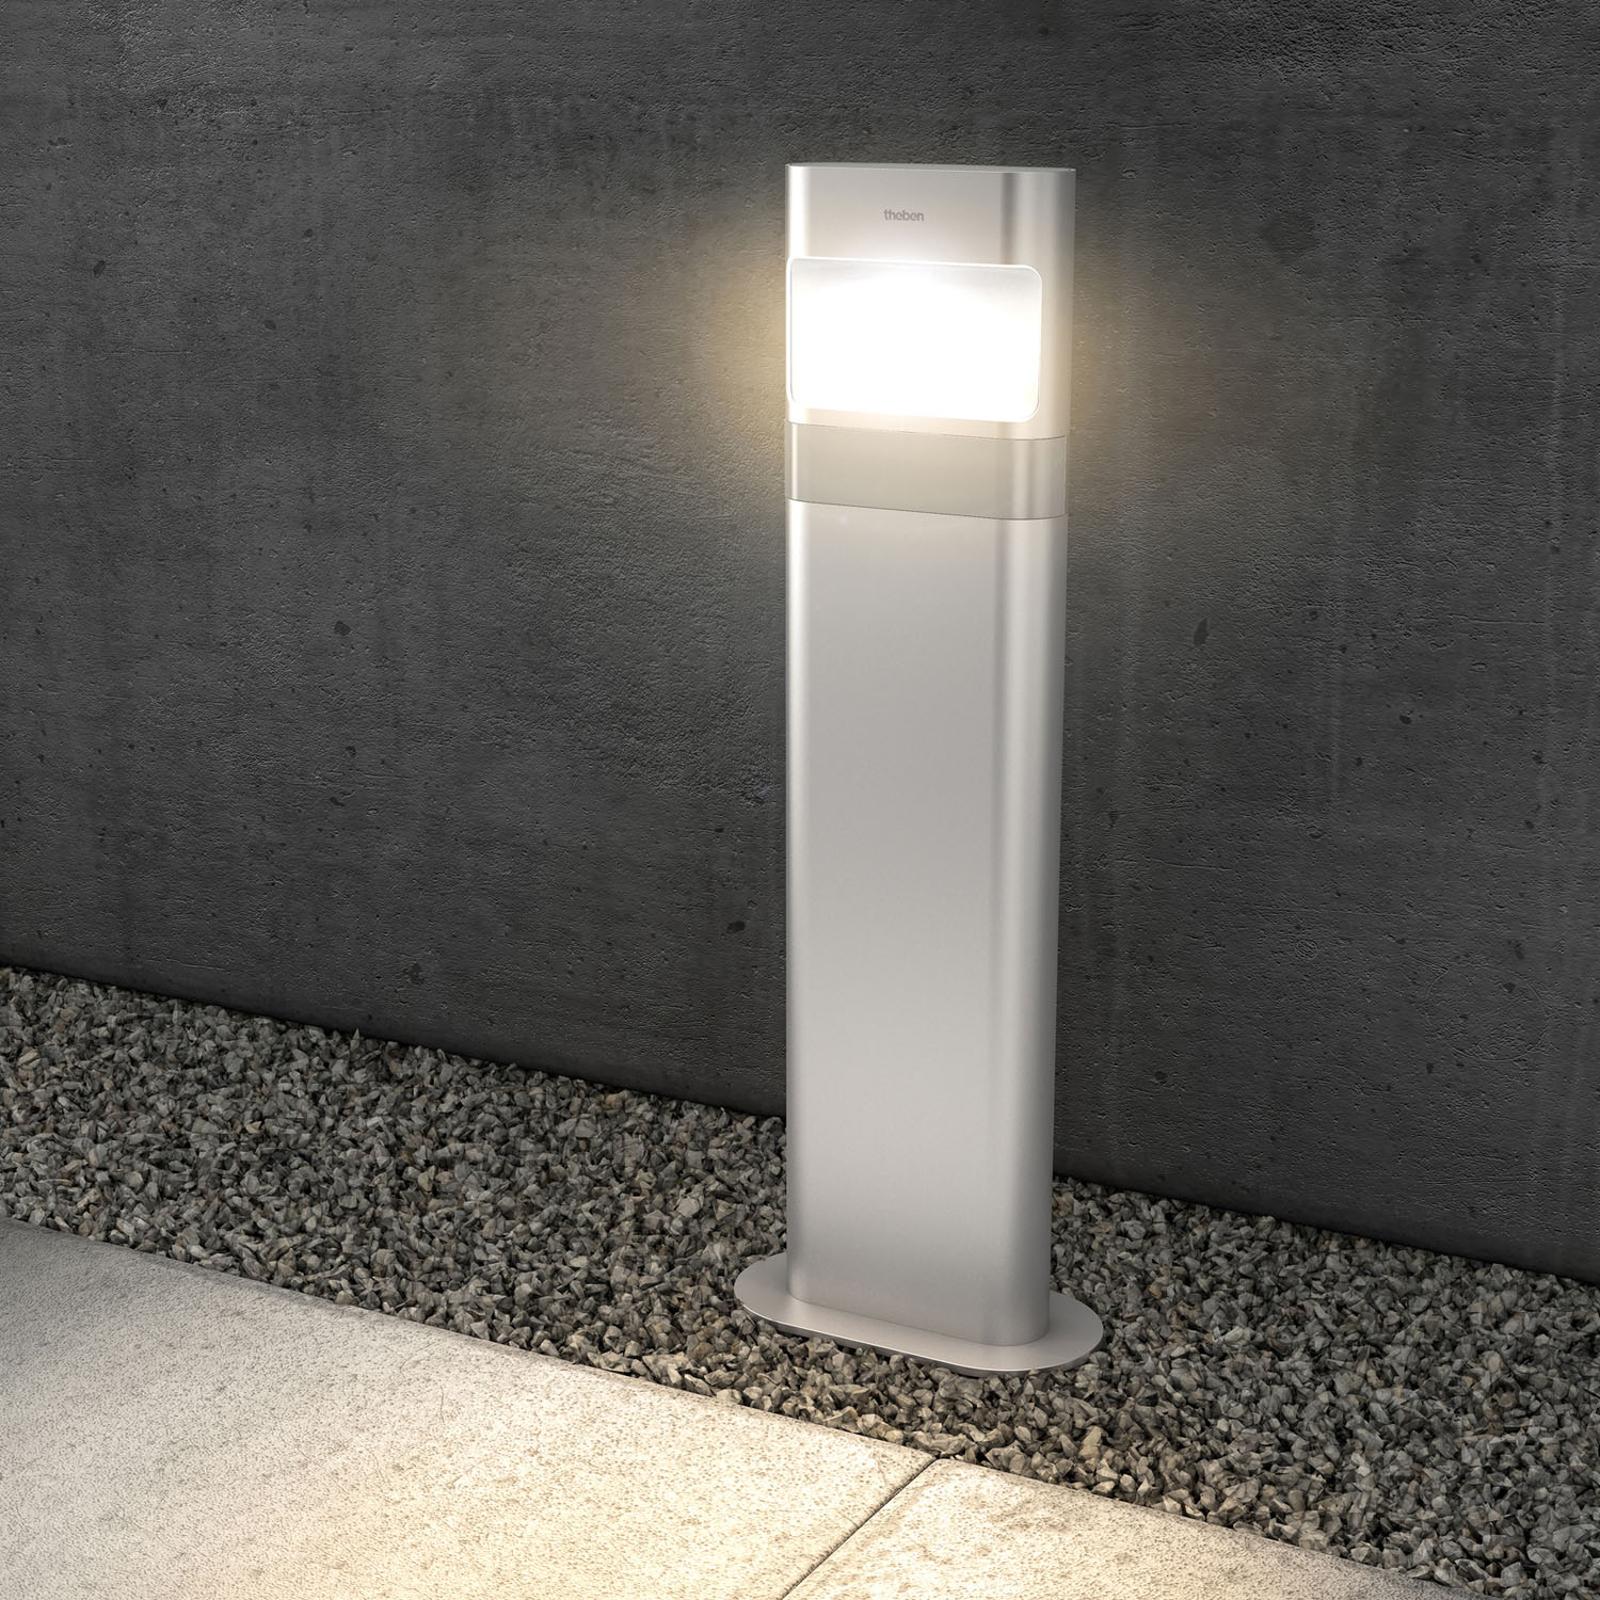 Theben theLeda D BL plus AL borne lumineuse, 72cm